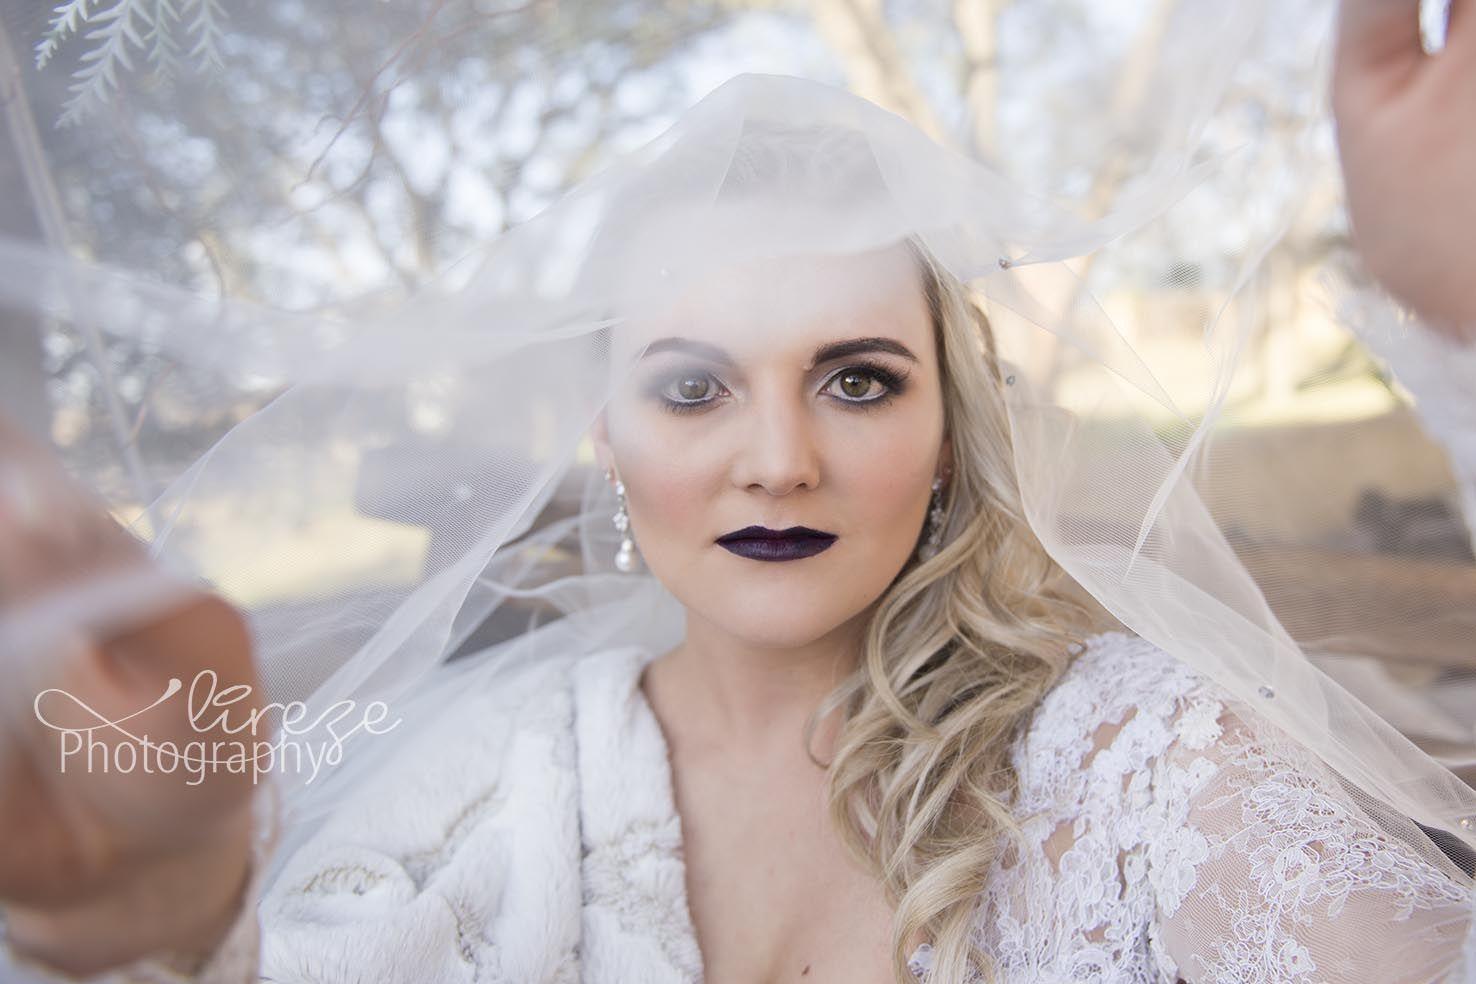 cradle valley wedding venue muldersdrift gauteng | wedding